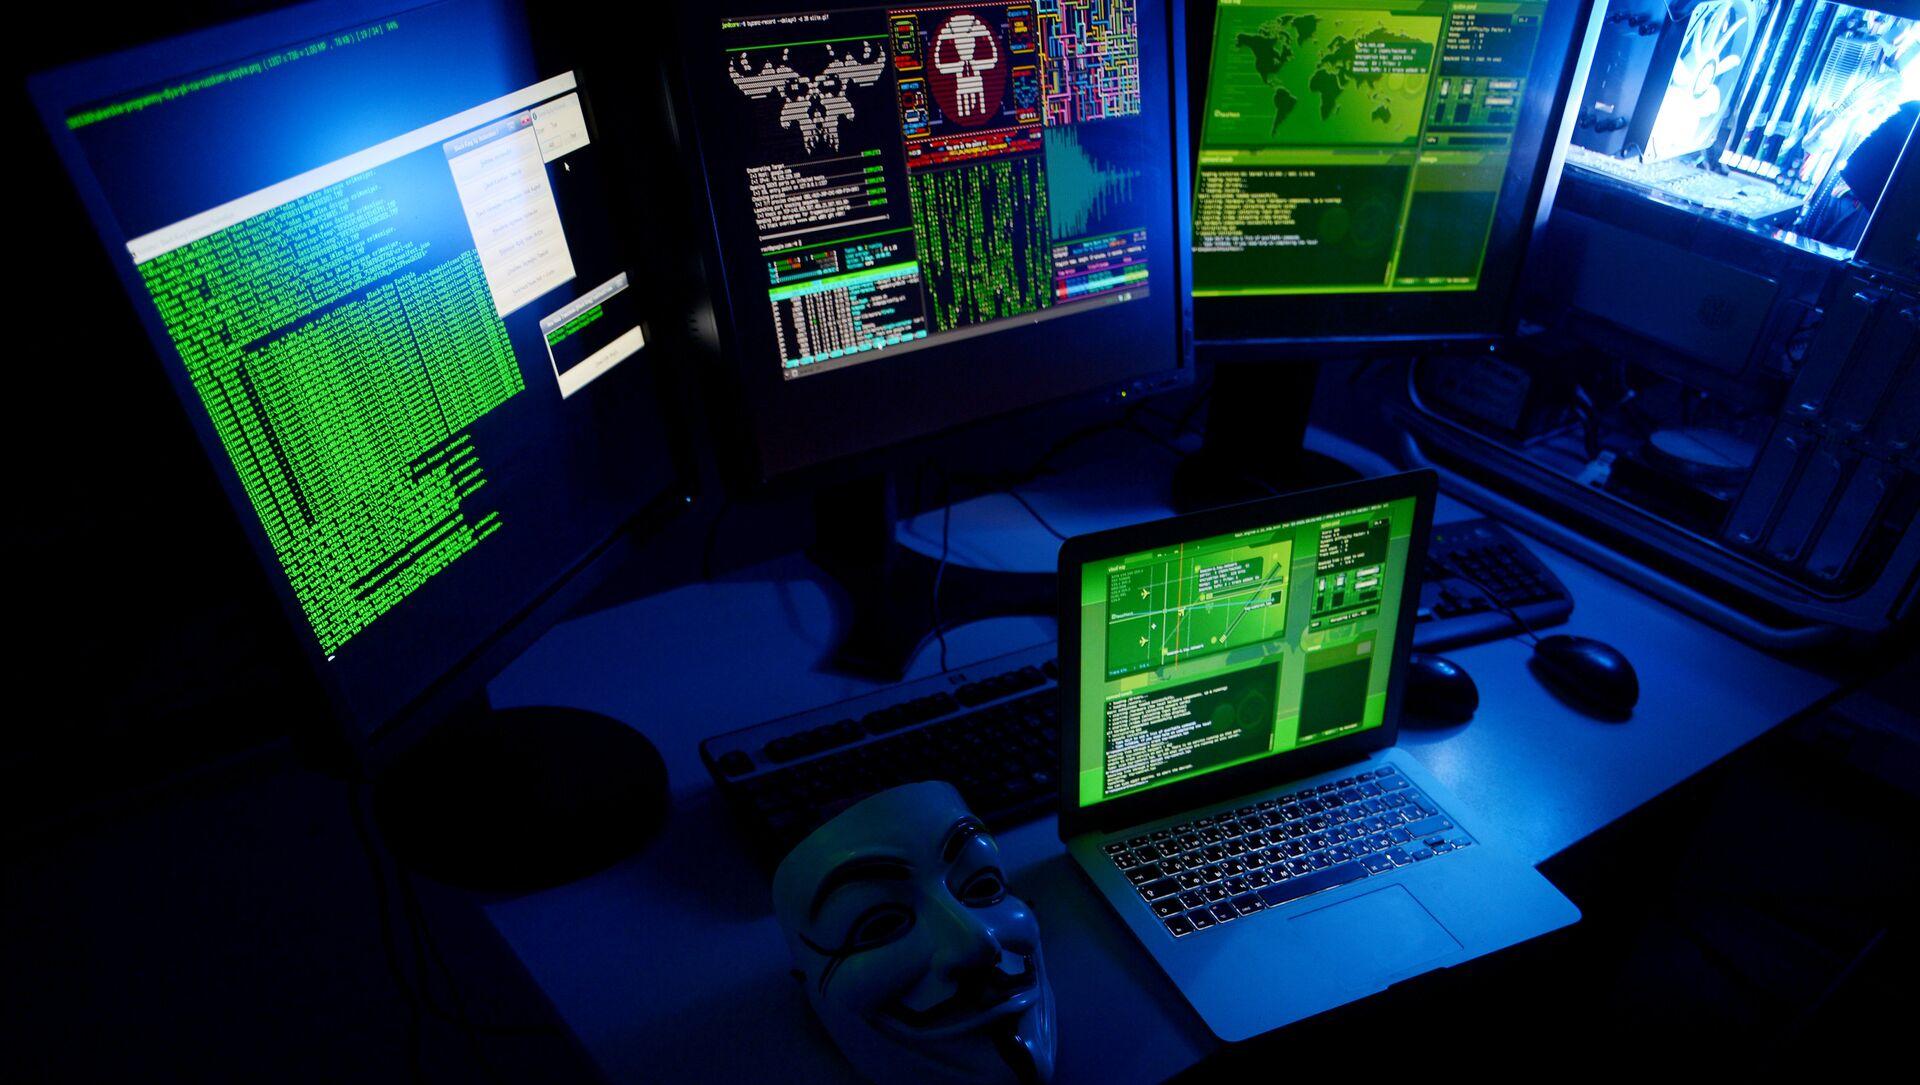 Ransomware attacks global IT systems - Sputnik International, 1920, 29.07.2021